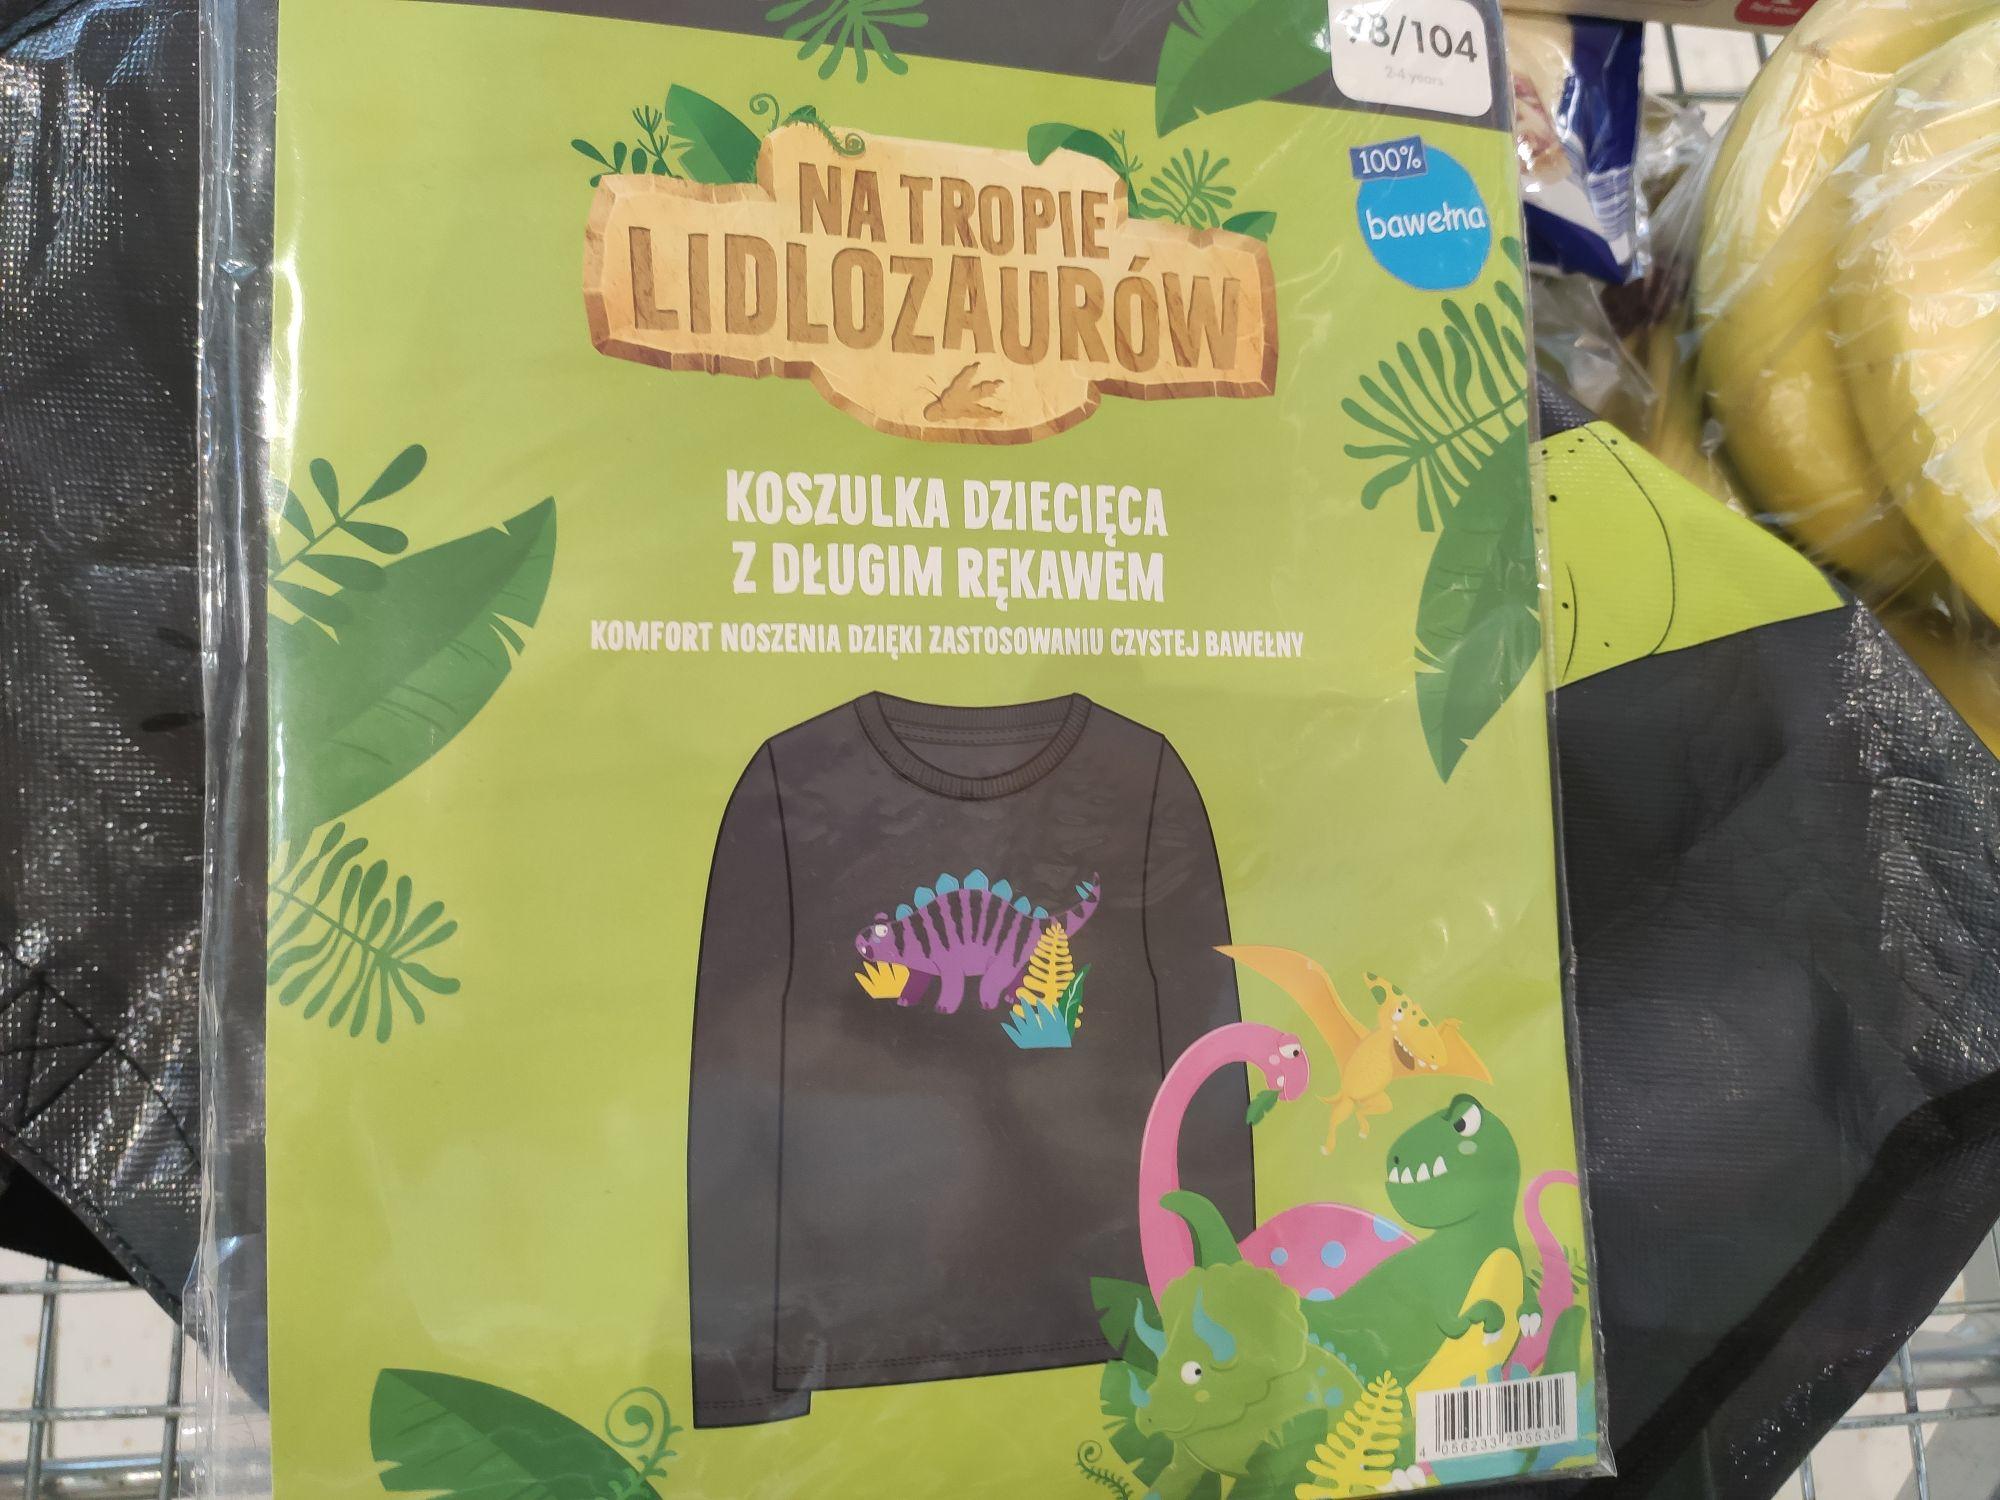 Koszulka dziecięca Lidl